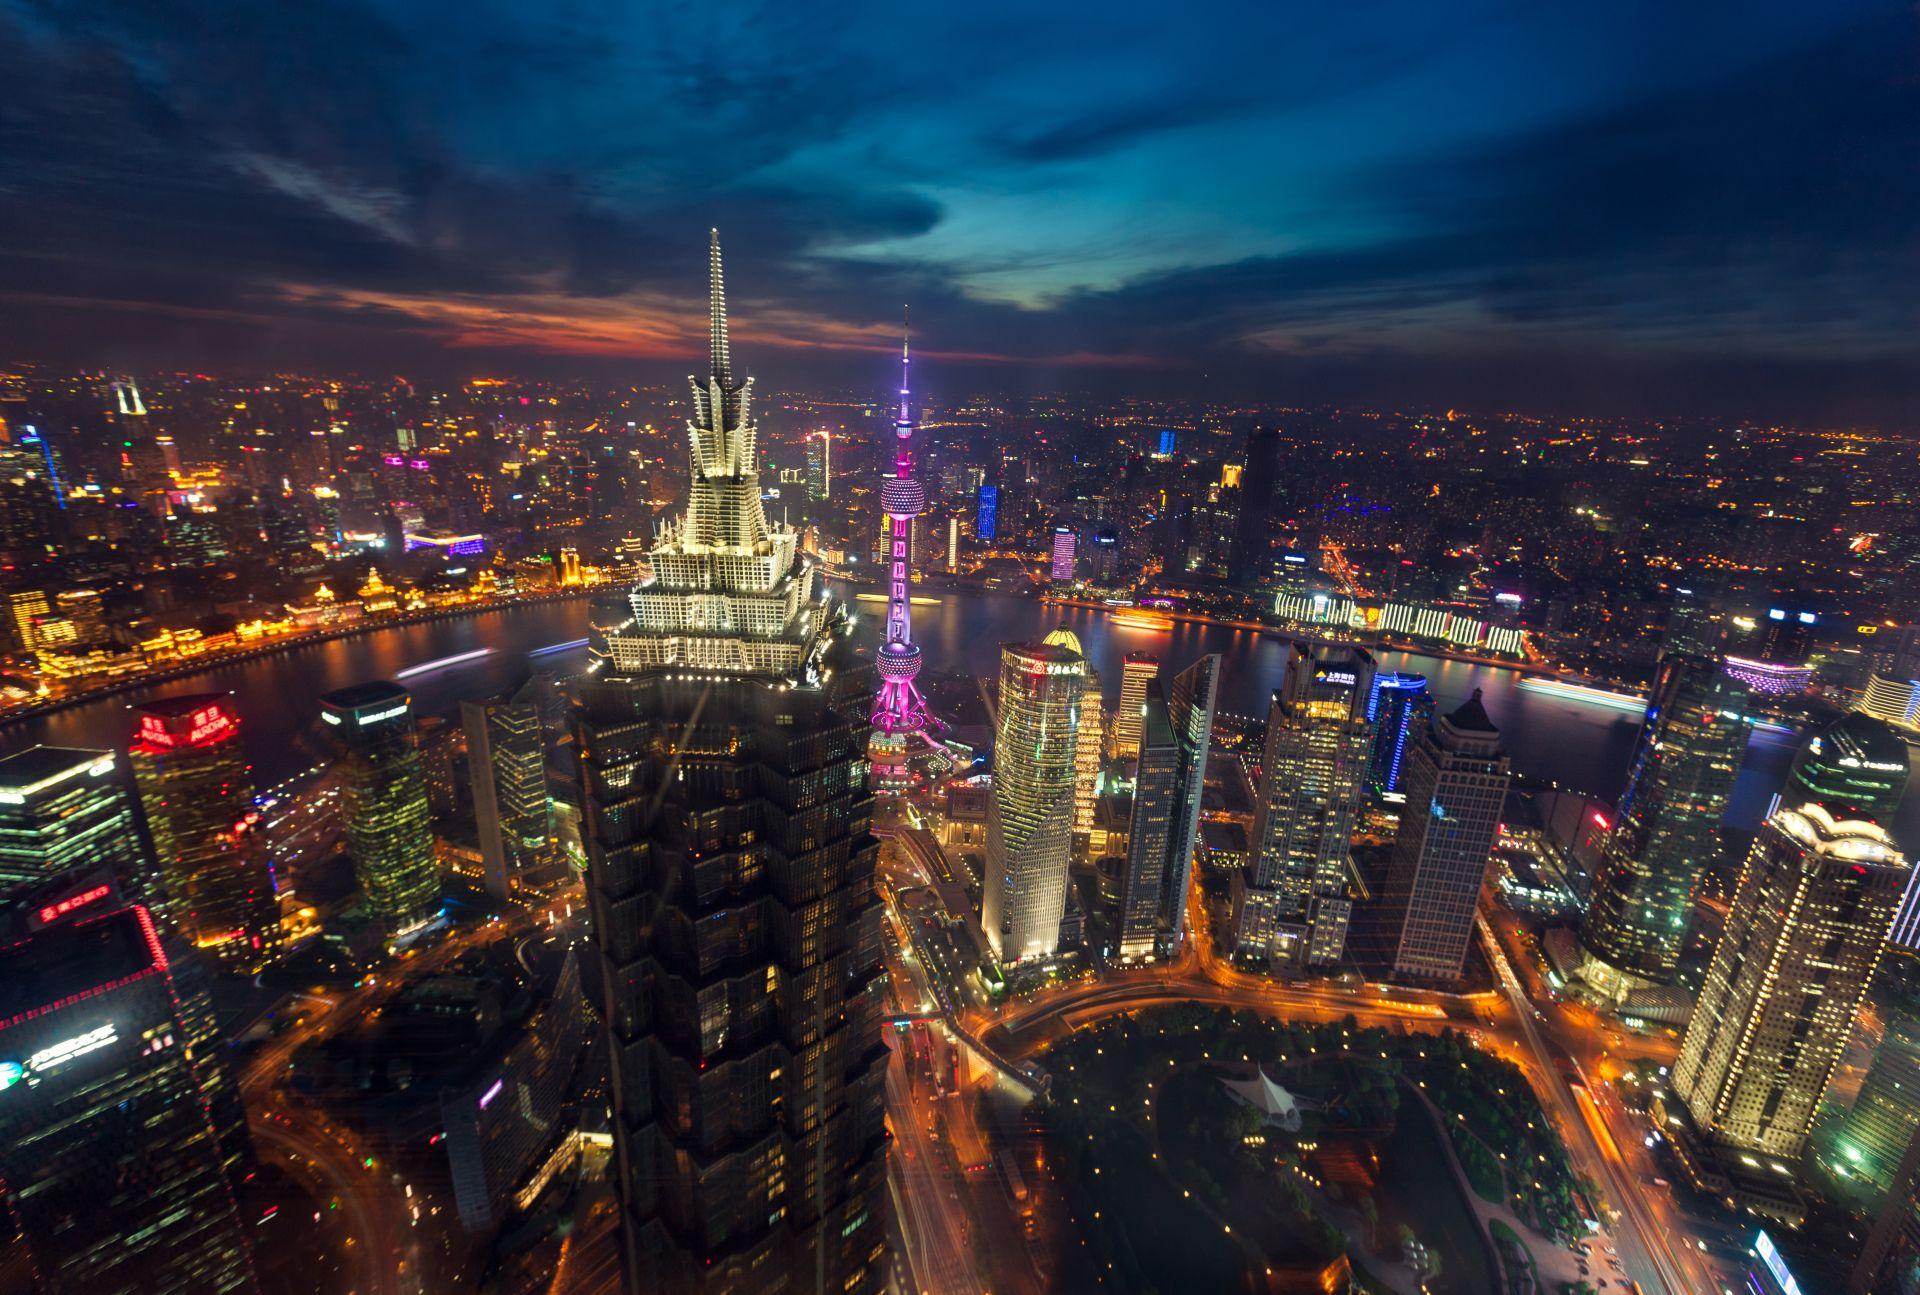 Man Made Shanghai Sky Architecture China Aerial Night Wallpaper